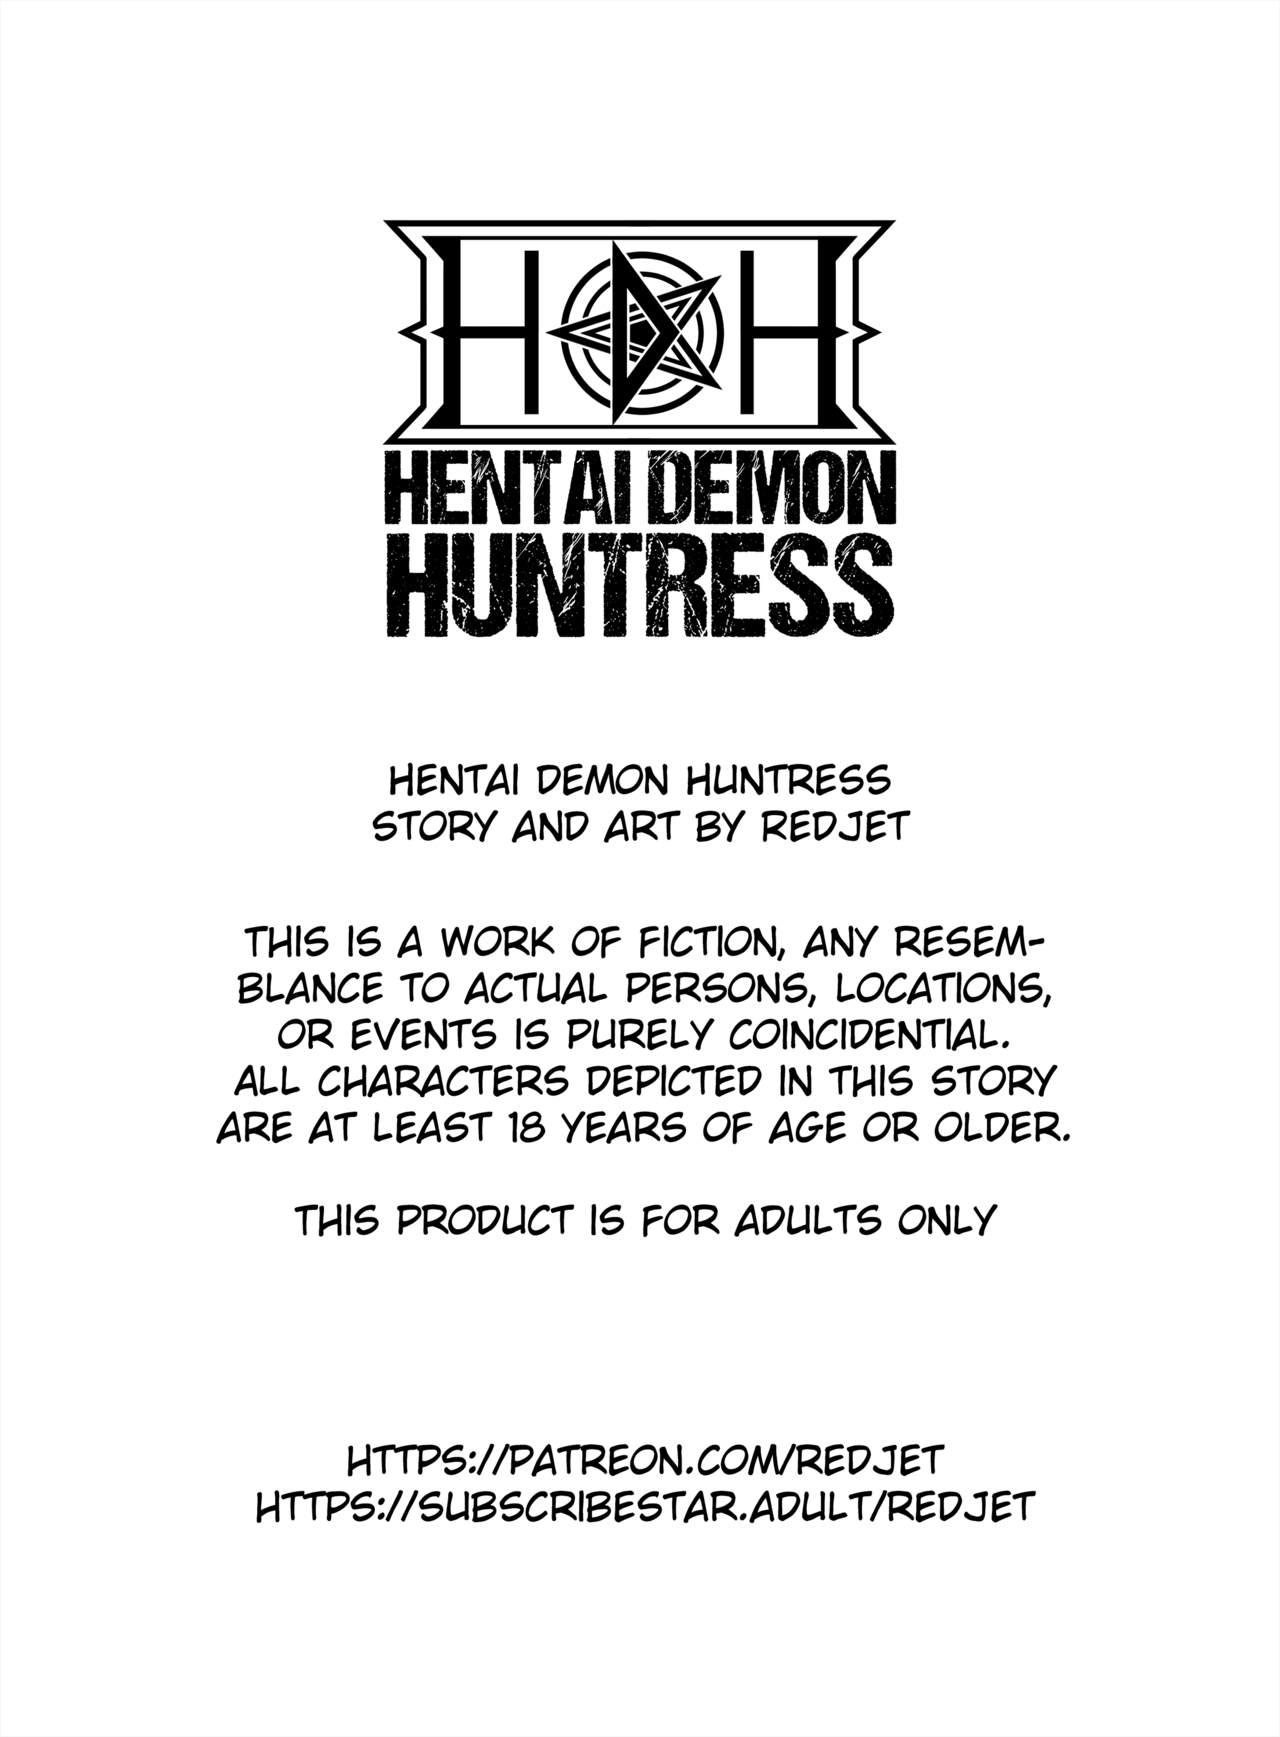 Hentai Demon Huntress Chapter 5 Redjet 02